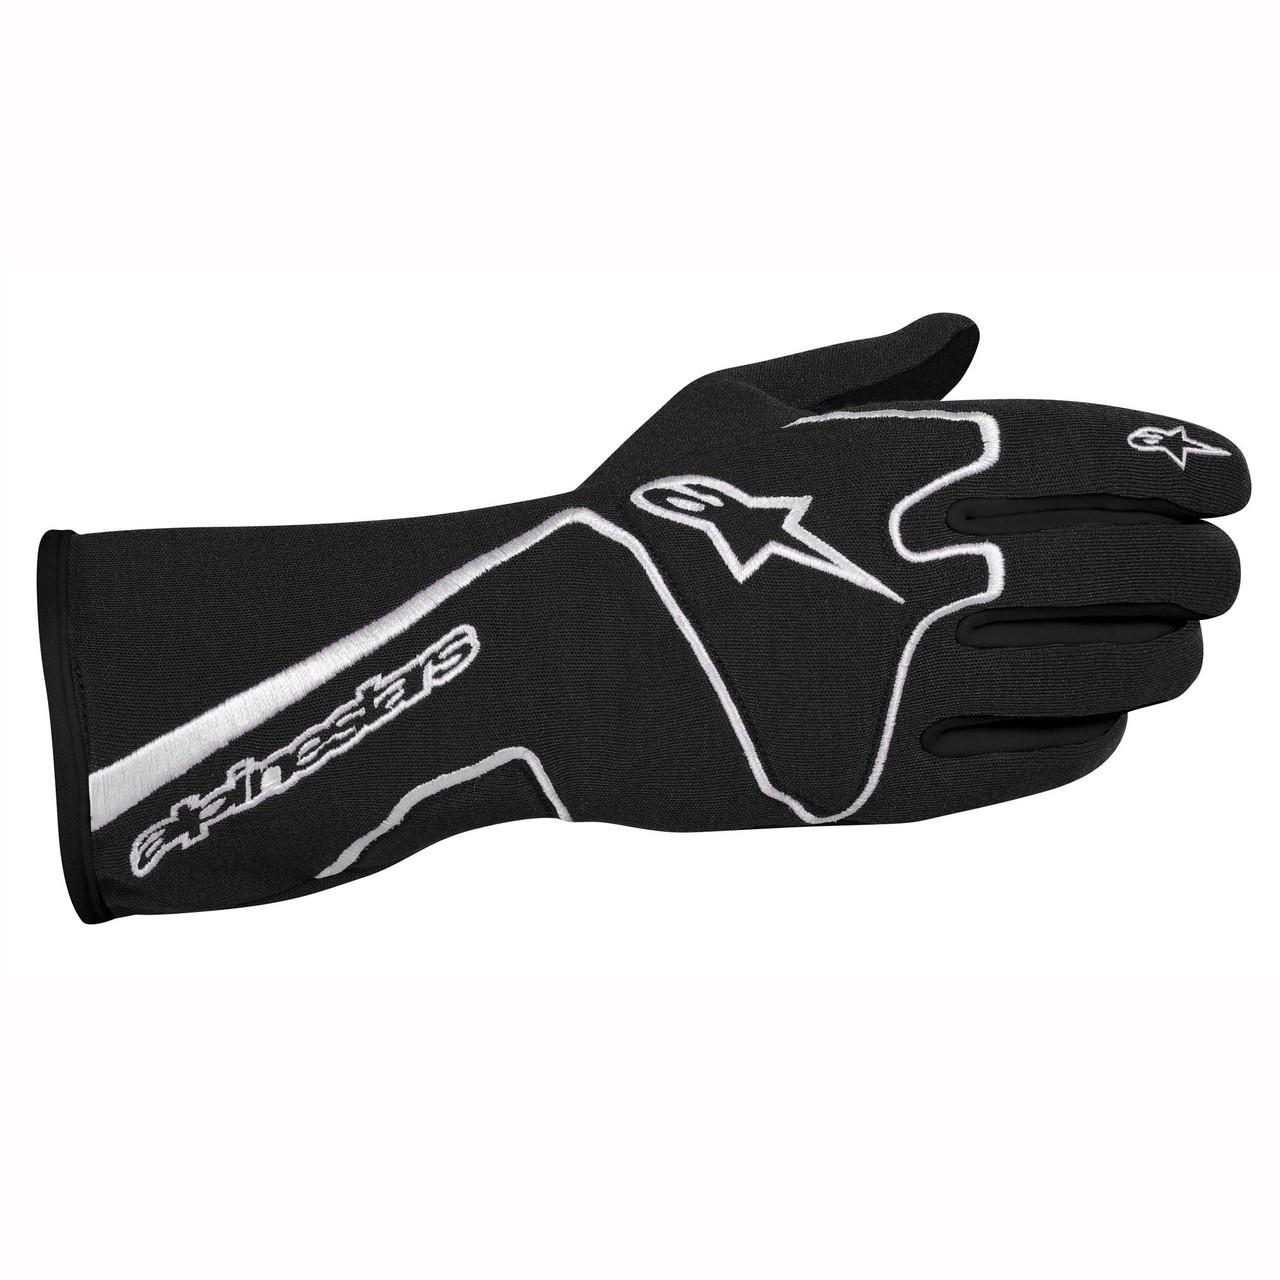 Alpine Stars 2015 Tech 1 Race Driver's Gloves - ON SALE